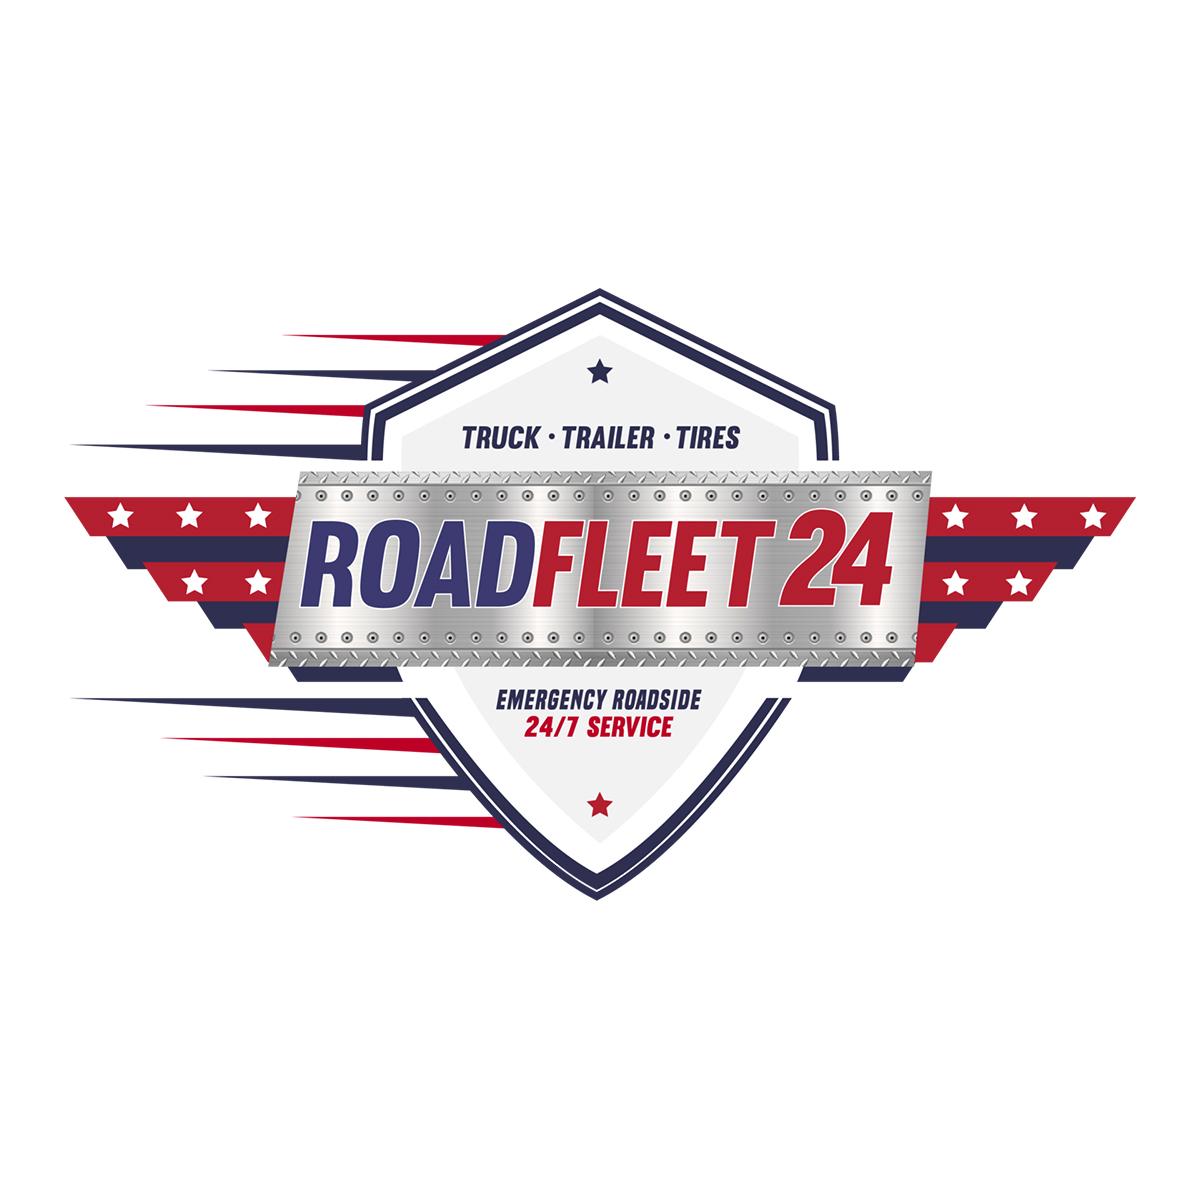 roadfleet24.jpg